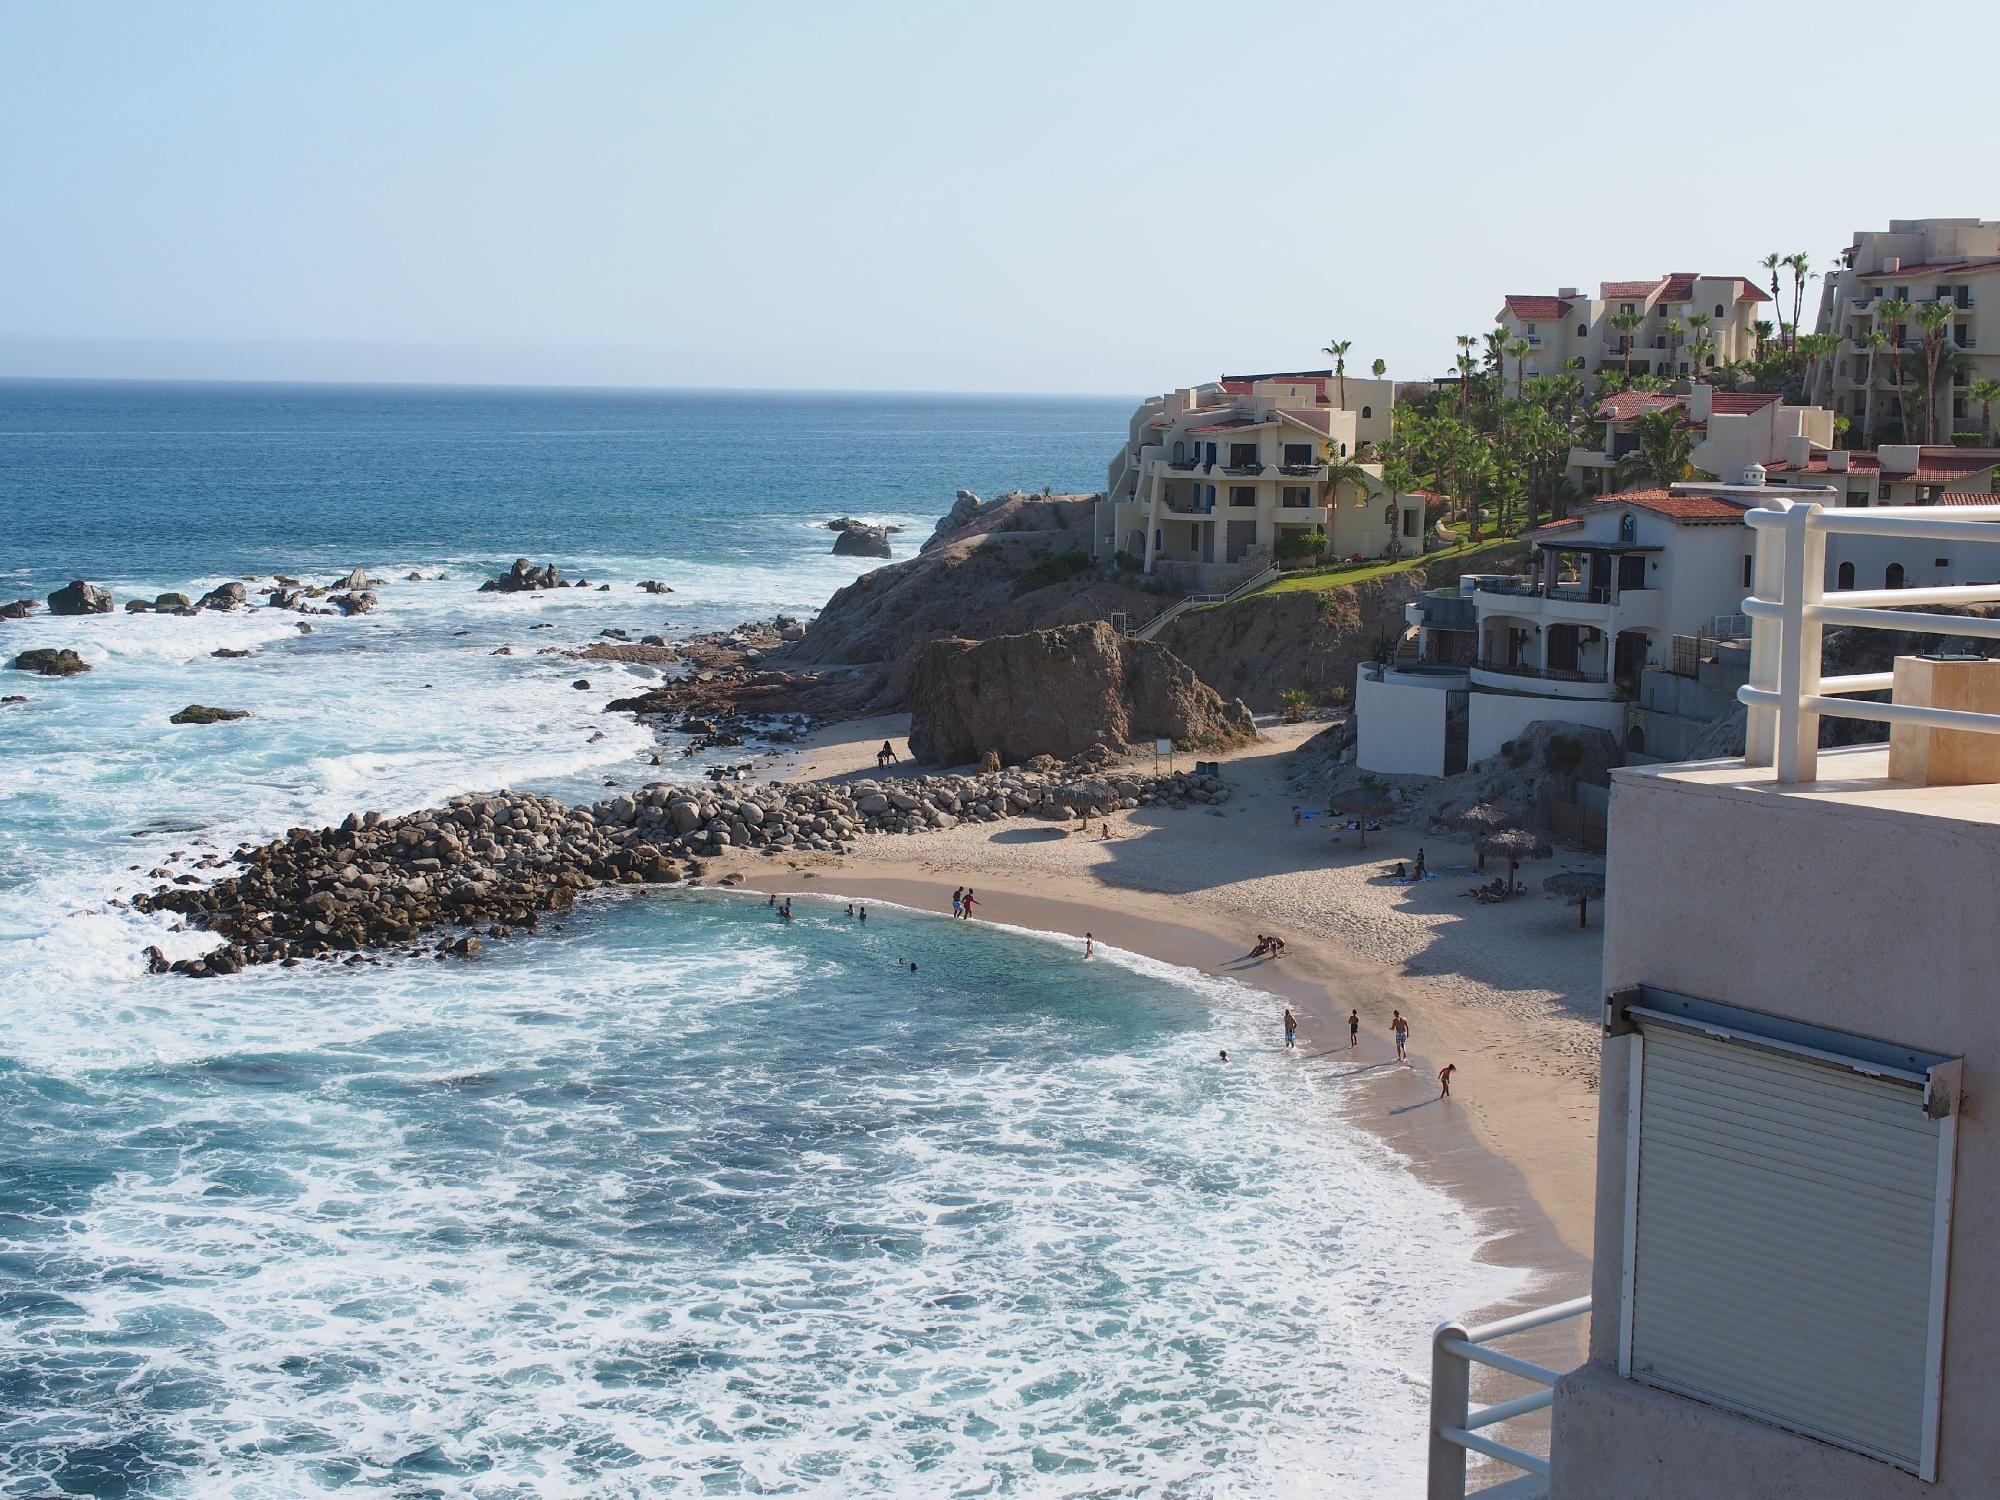 Welk_Resorts_Cabo_San_Lucas_Sirena_del_Mar_View_a4cd0f518b.jpg